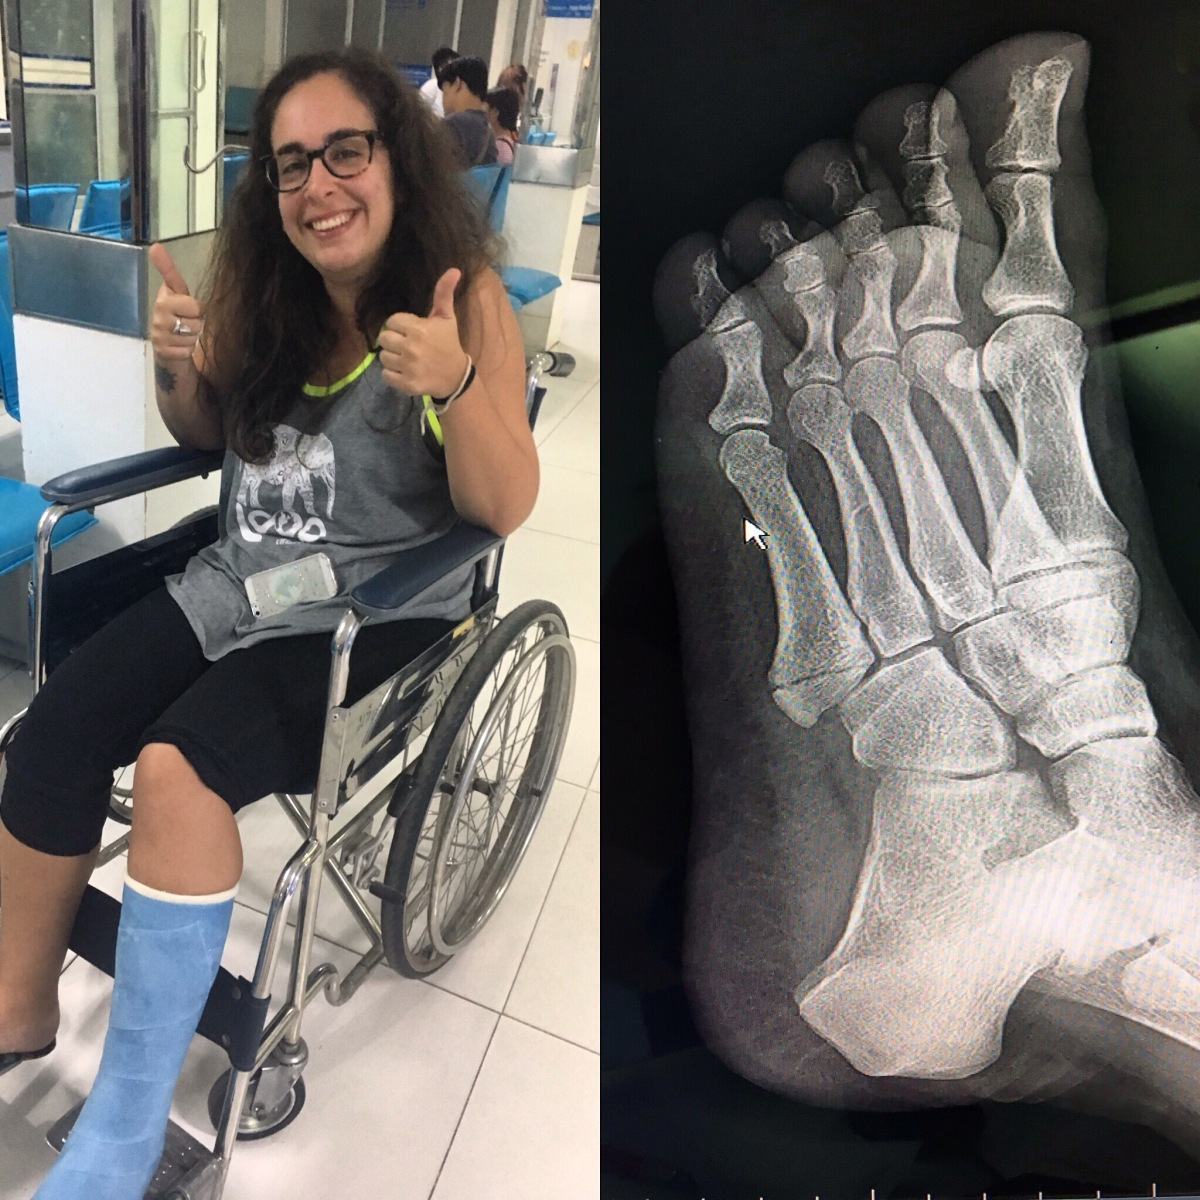 I broke my first bone and got my firstcast!